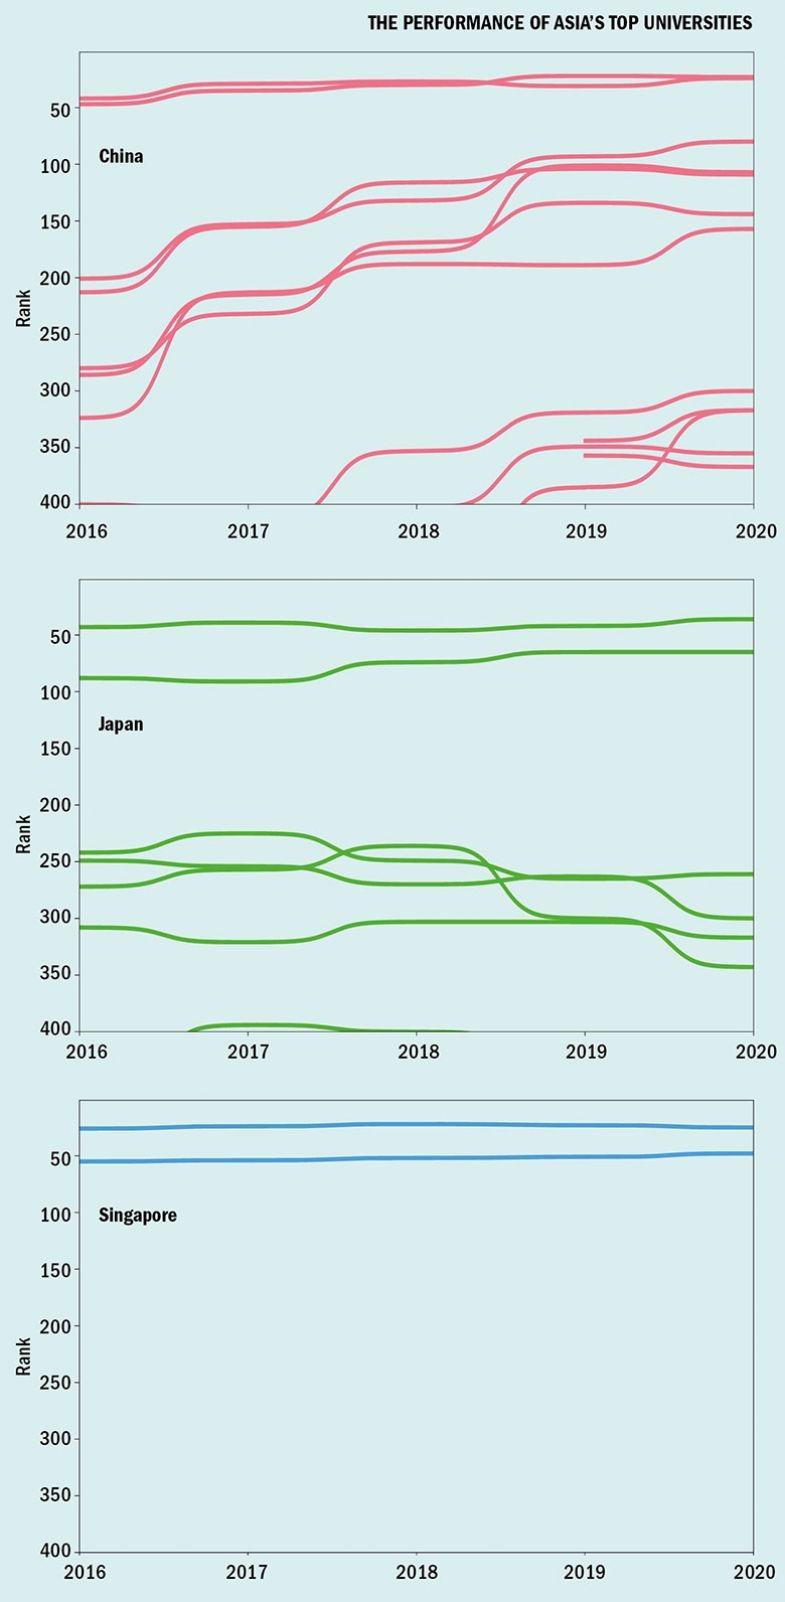 Performance of Asia's top universities